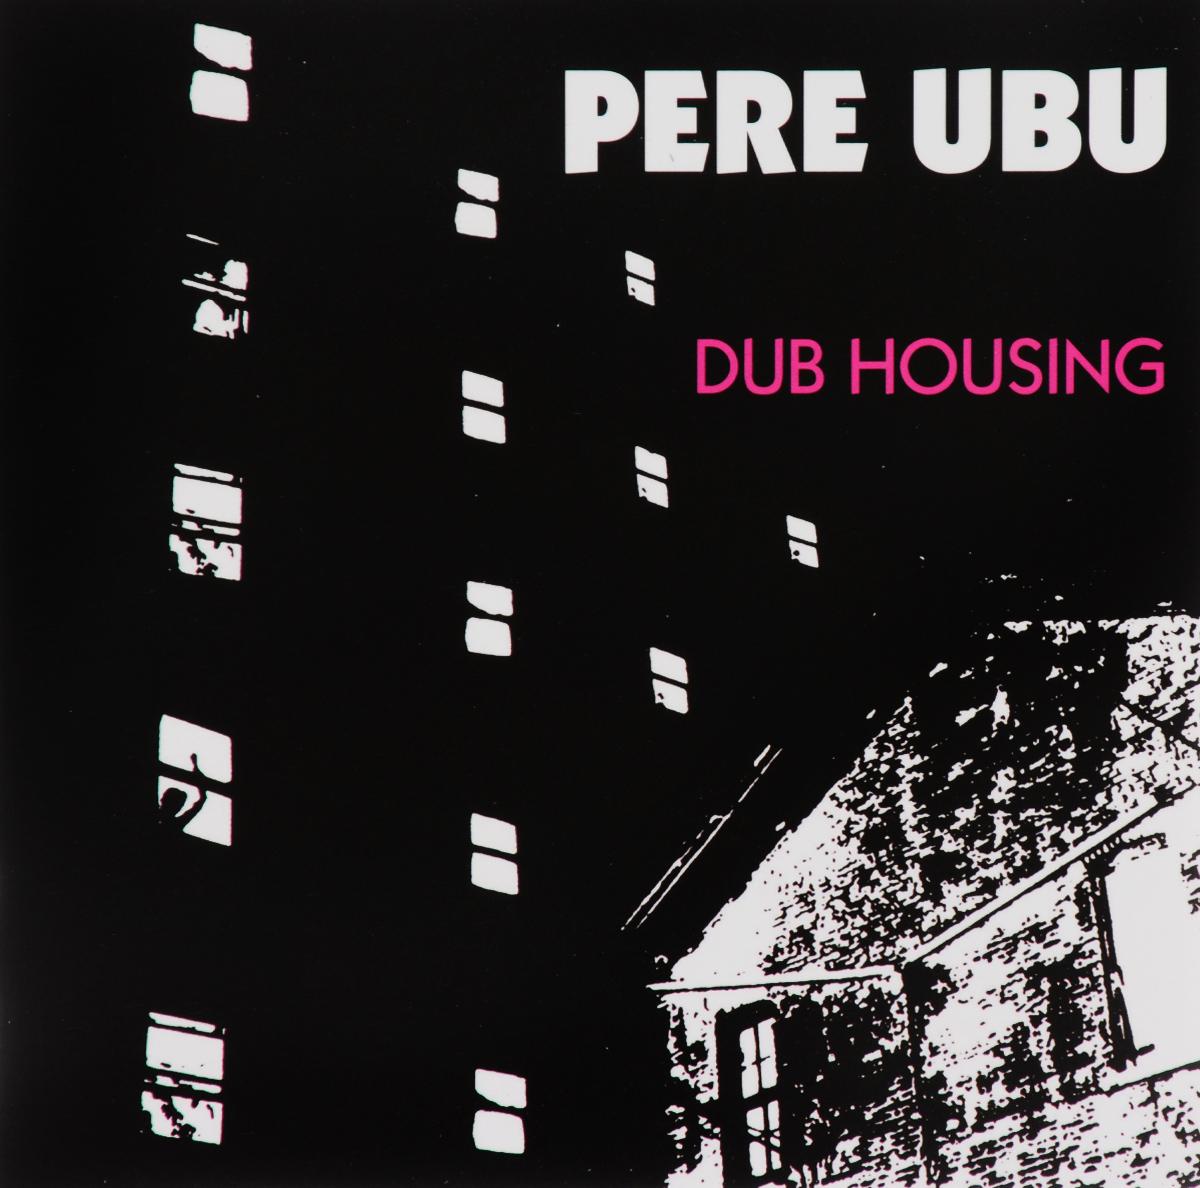 Pere Ubu Pere Ubu. Dub Housing le pere goriot